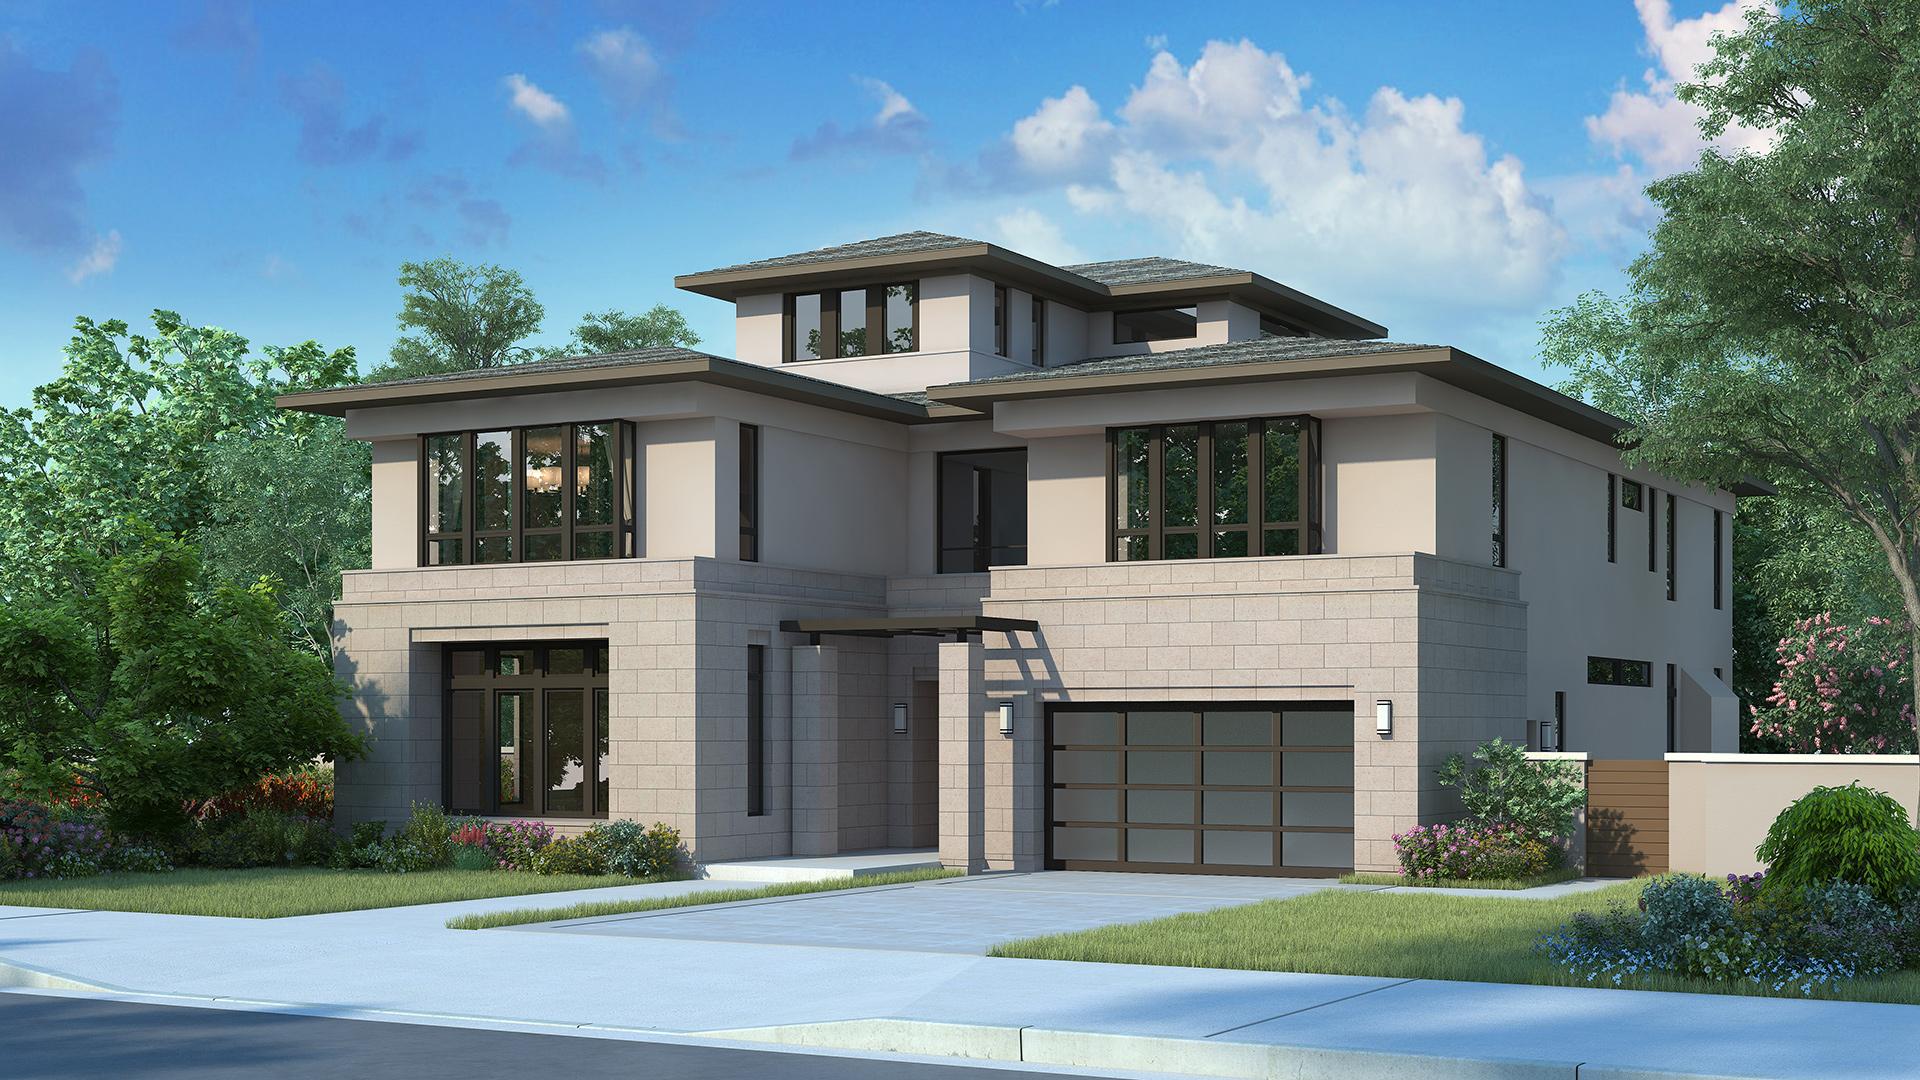 Alara at altair the calypso elite home design for Elite home designs